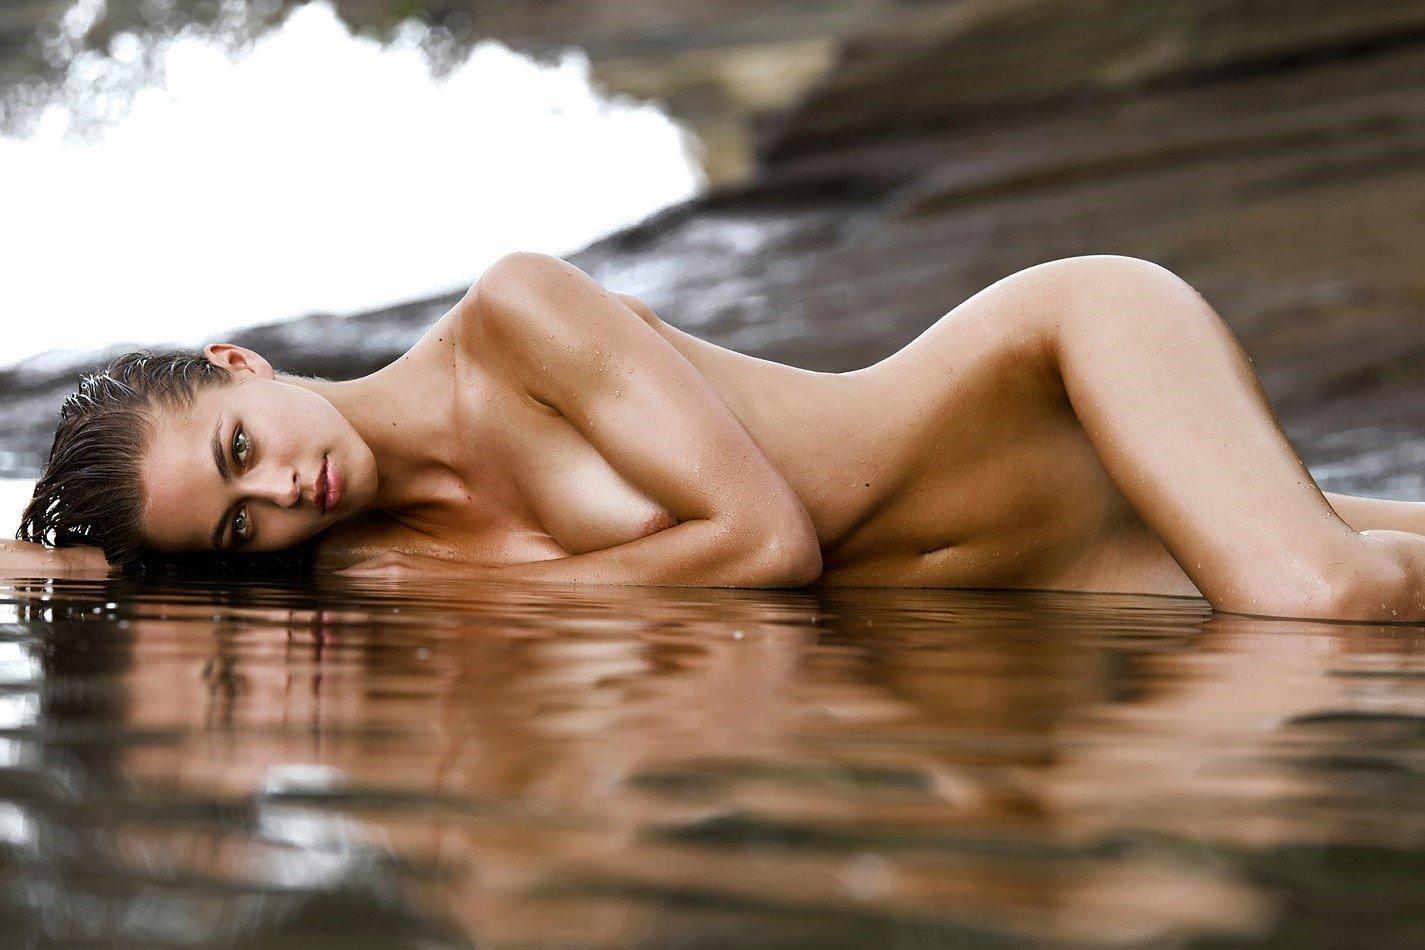 Anne kelley nude